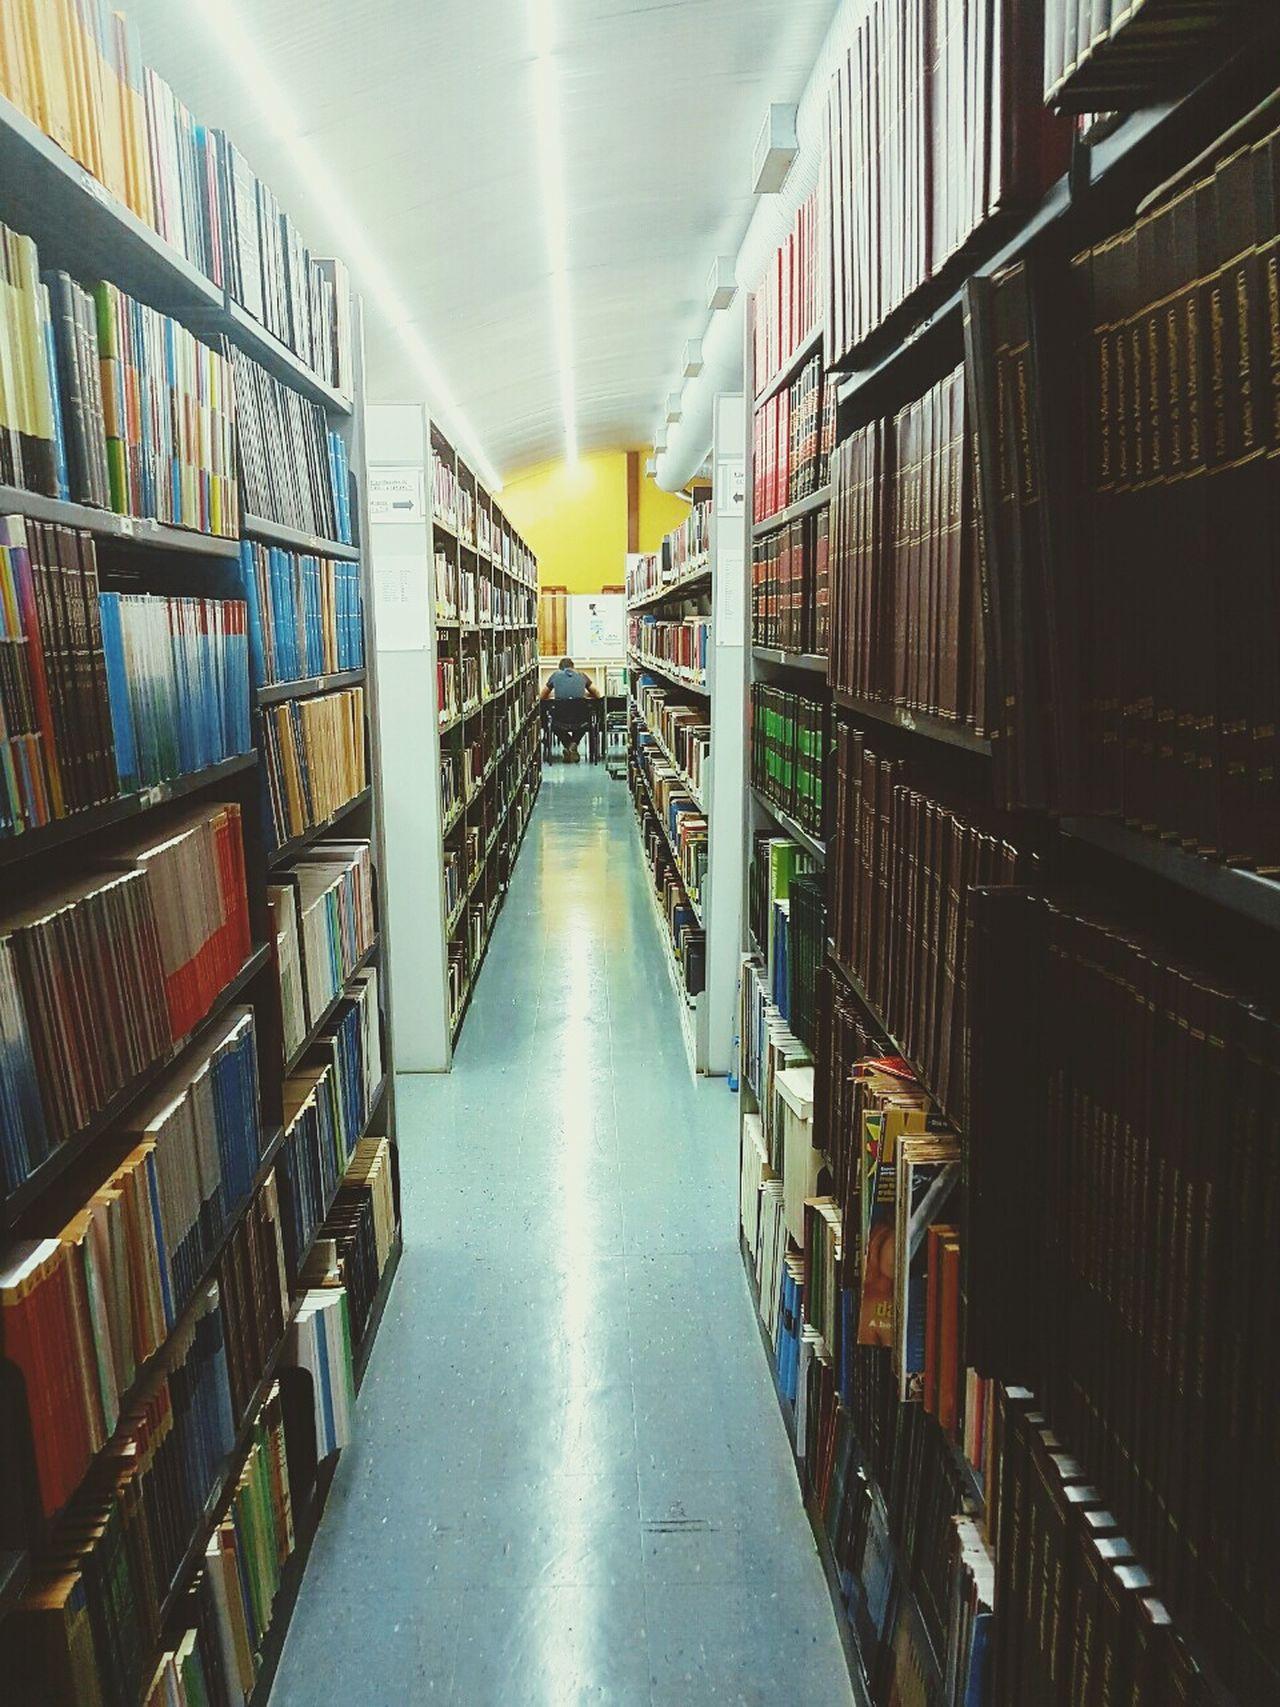 Books Studying Hard Study Life Sacrifice Dedication